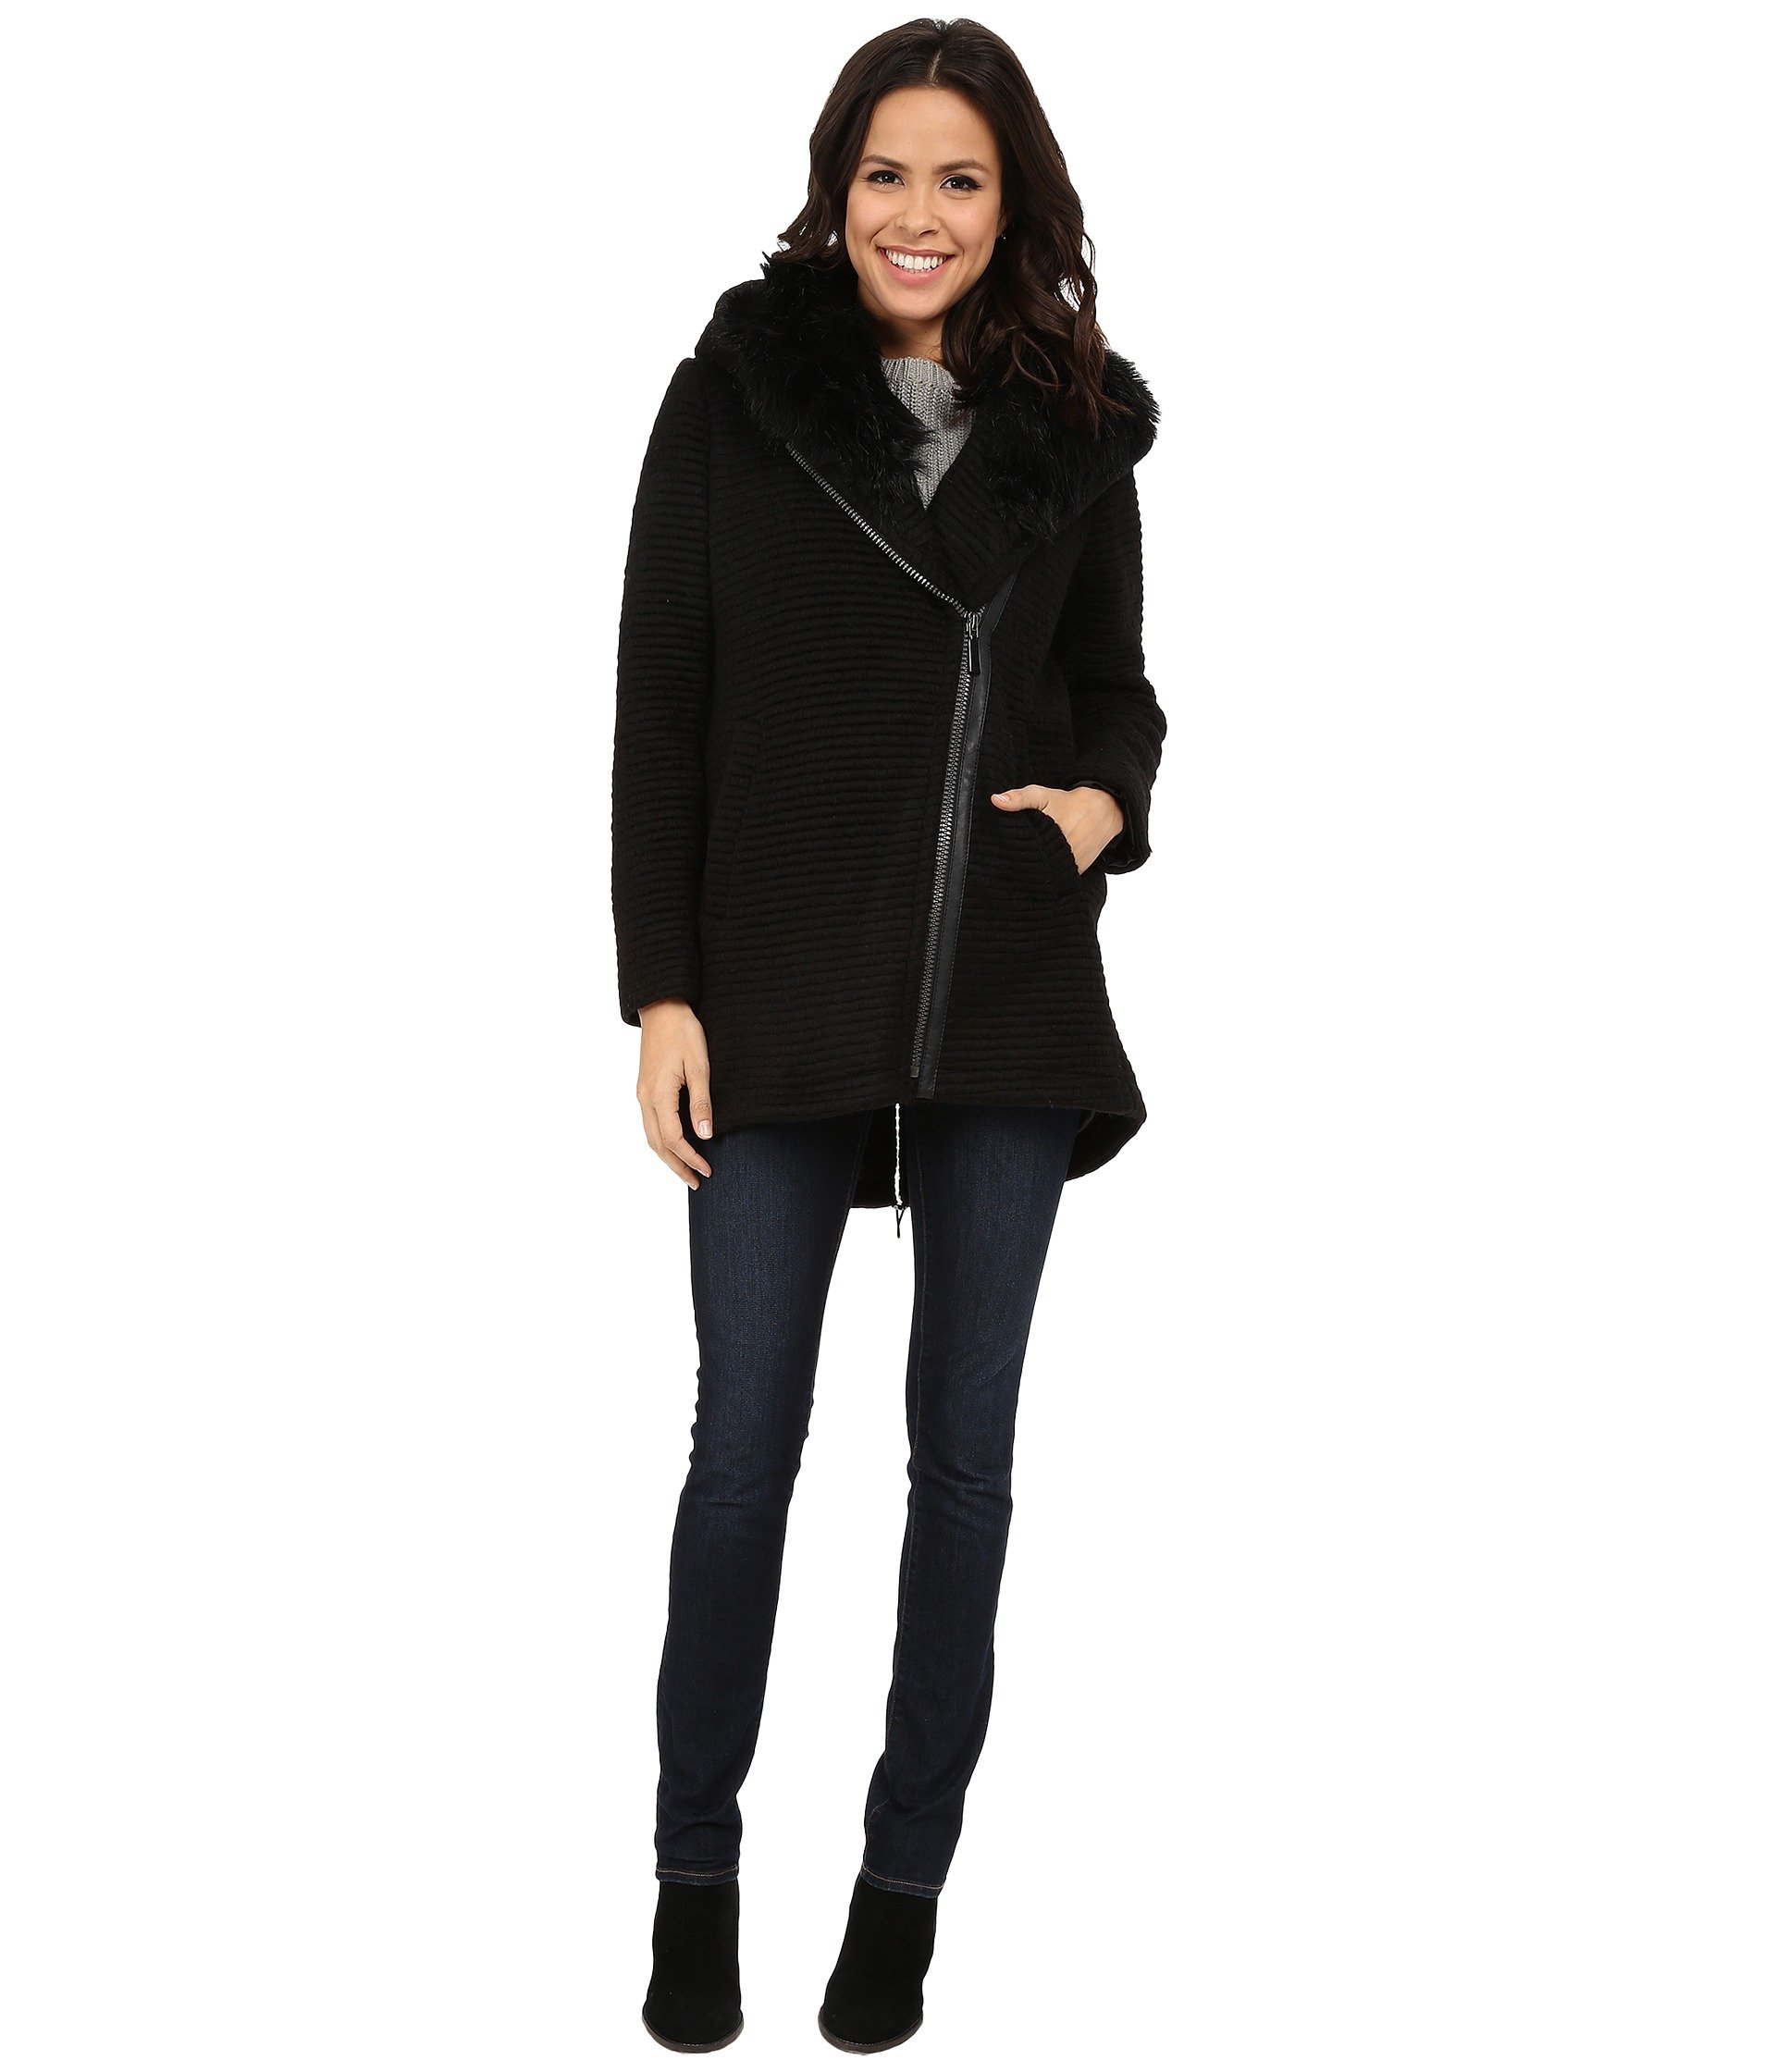 Vince Camuto Women's Fur Hood Sweater Coat J8241 Black Medium